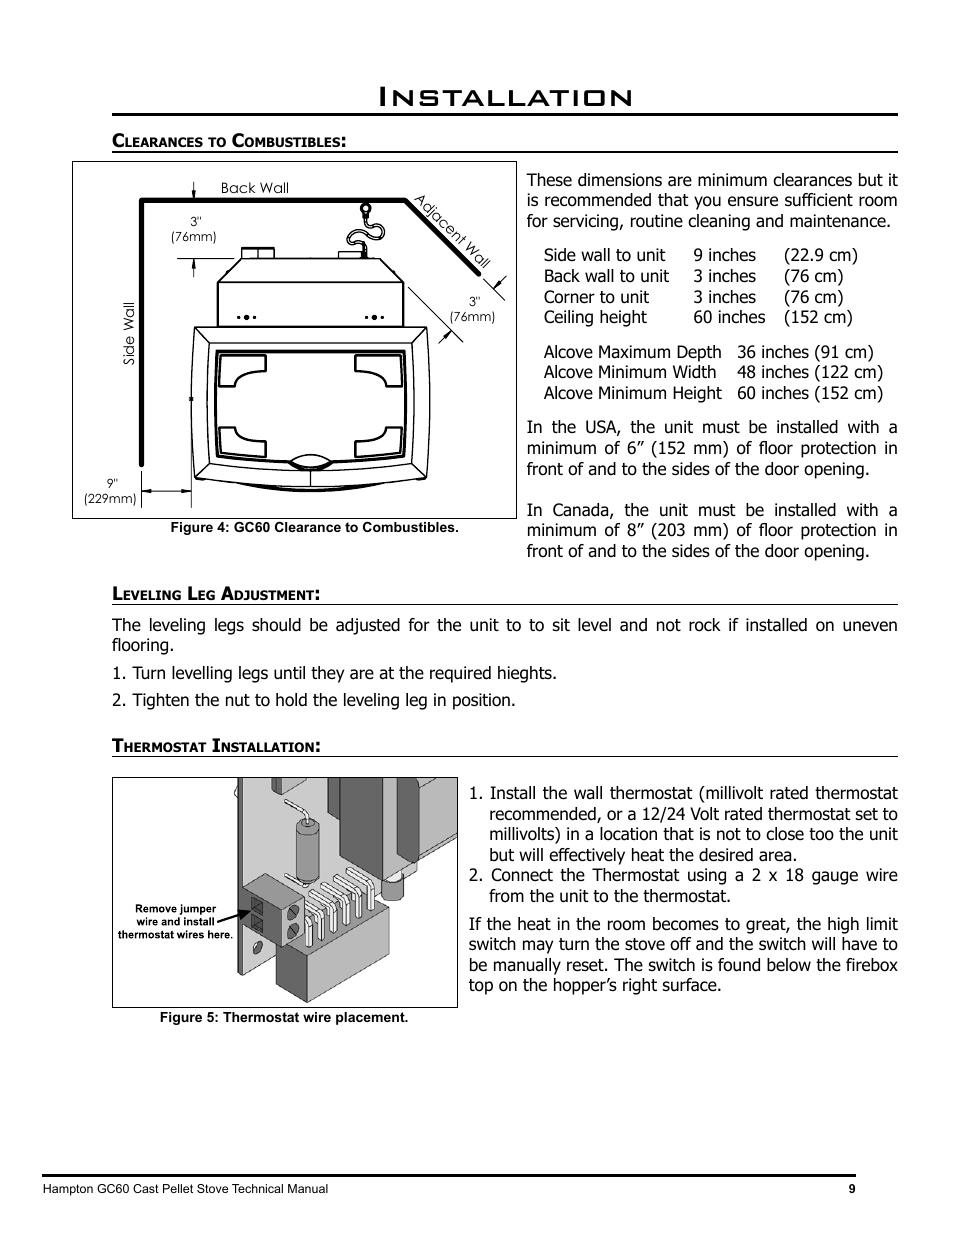 Installation | Regency Hampton GC60 Large Pellet Stove TECHNICAL MANUAL  User Manual | Page 9 / 32